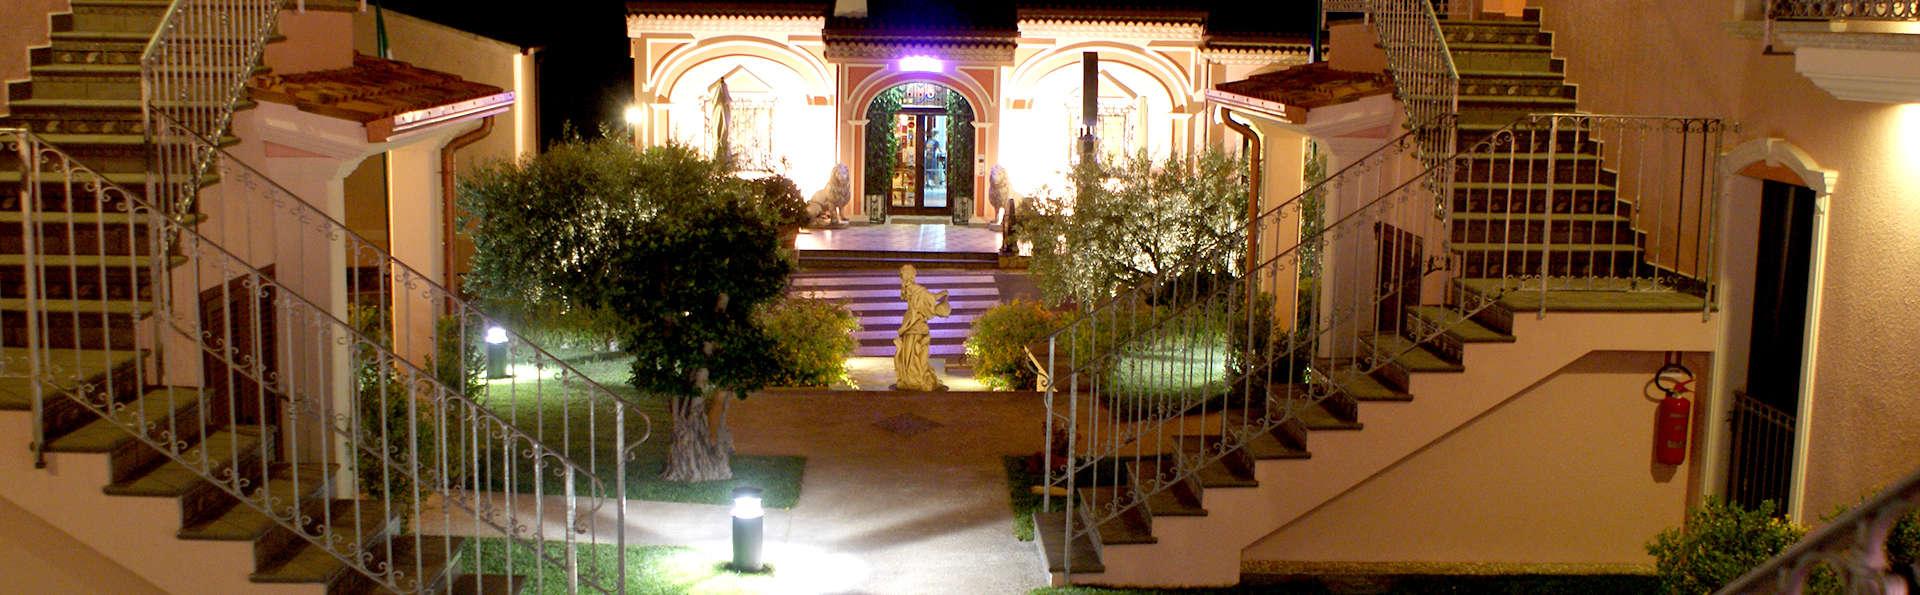 Hotel Ristorante Borgo La Tana - Edit_entry2.jpg